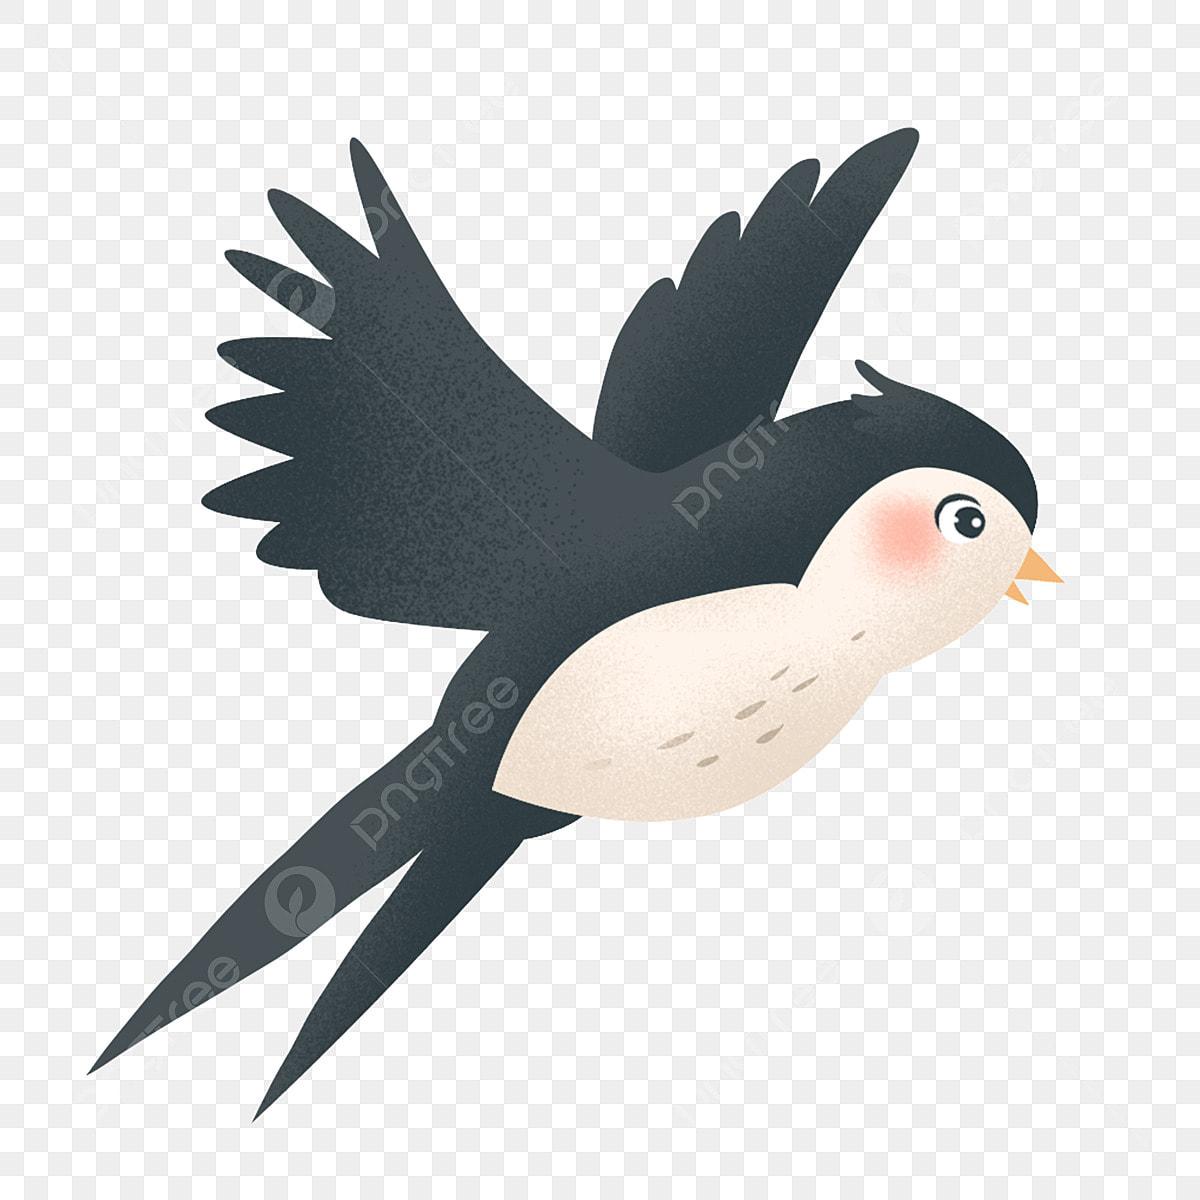 Paling Keren 15+ Gambar Burung Layang Layang - Gani Gambar